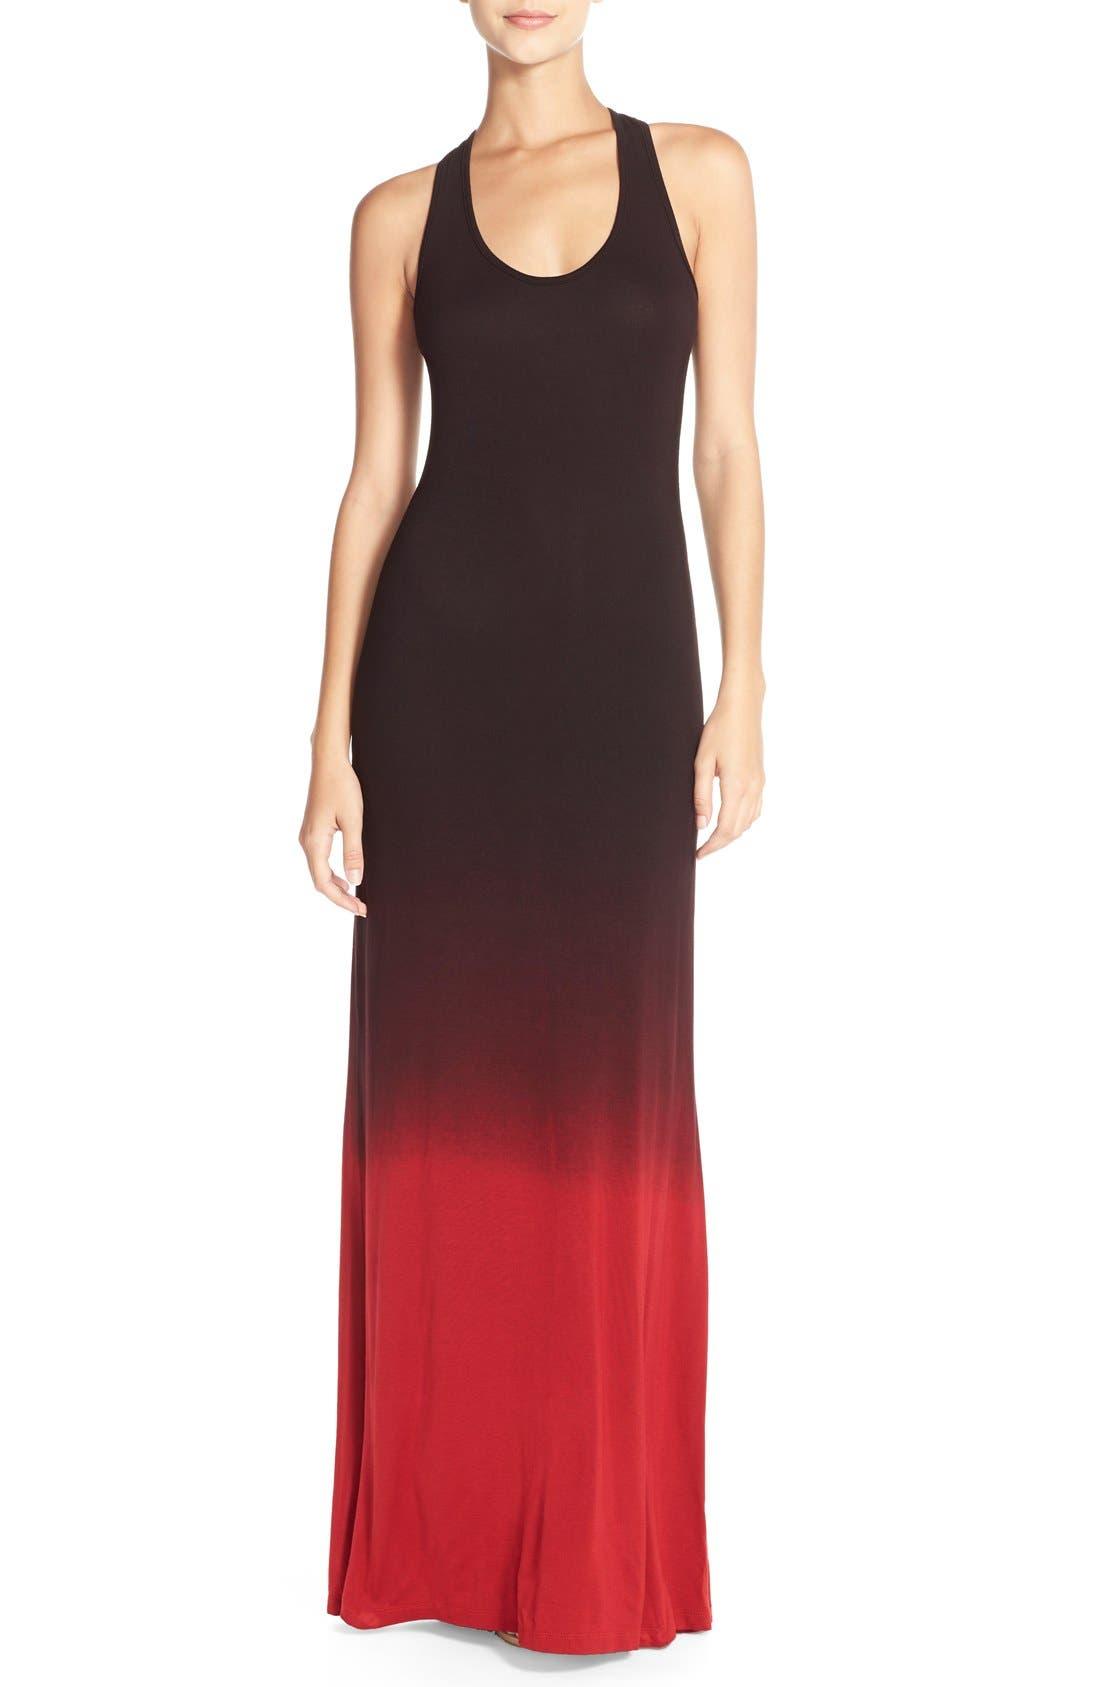 Racerback Maxi Dress,                         Main,                         color, Black/ Red Ombre